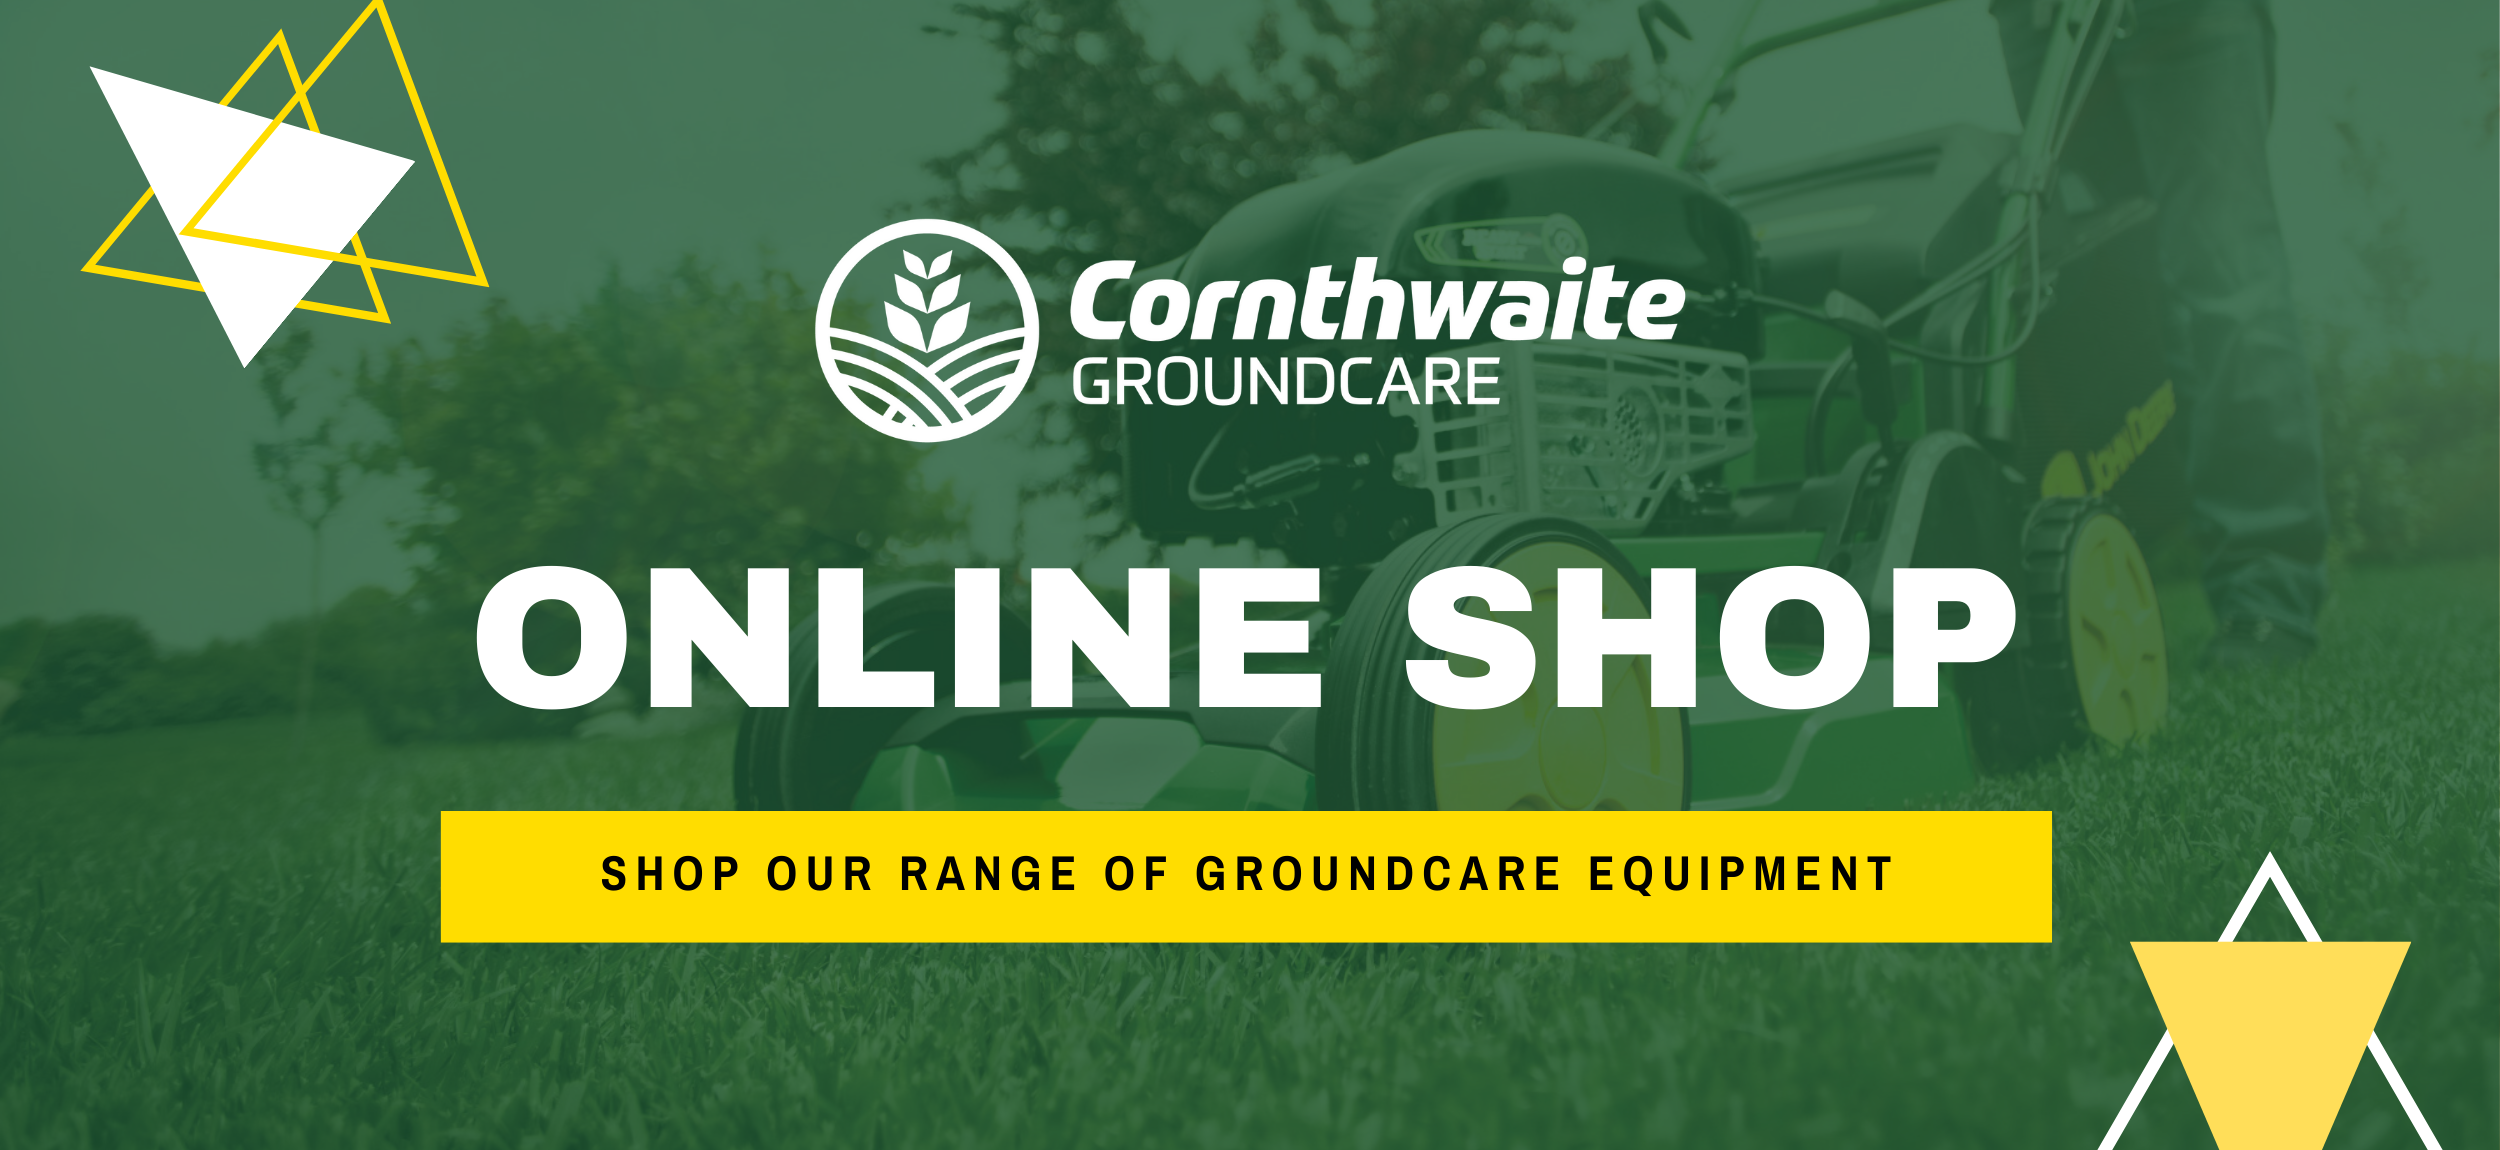 Cornthwaite Groundcare